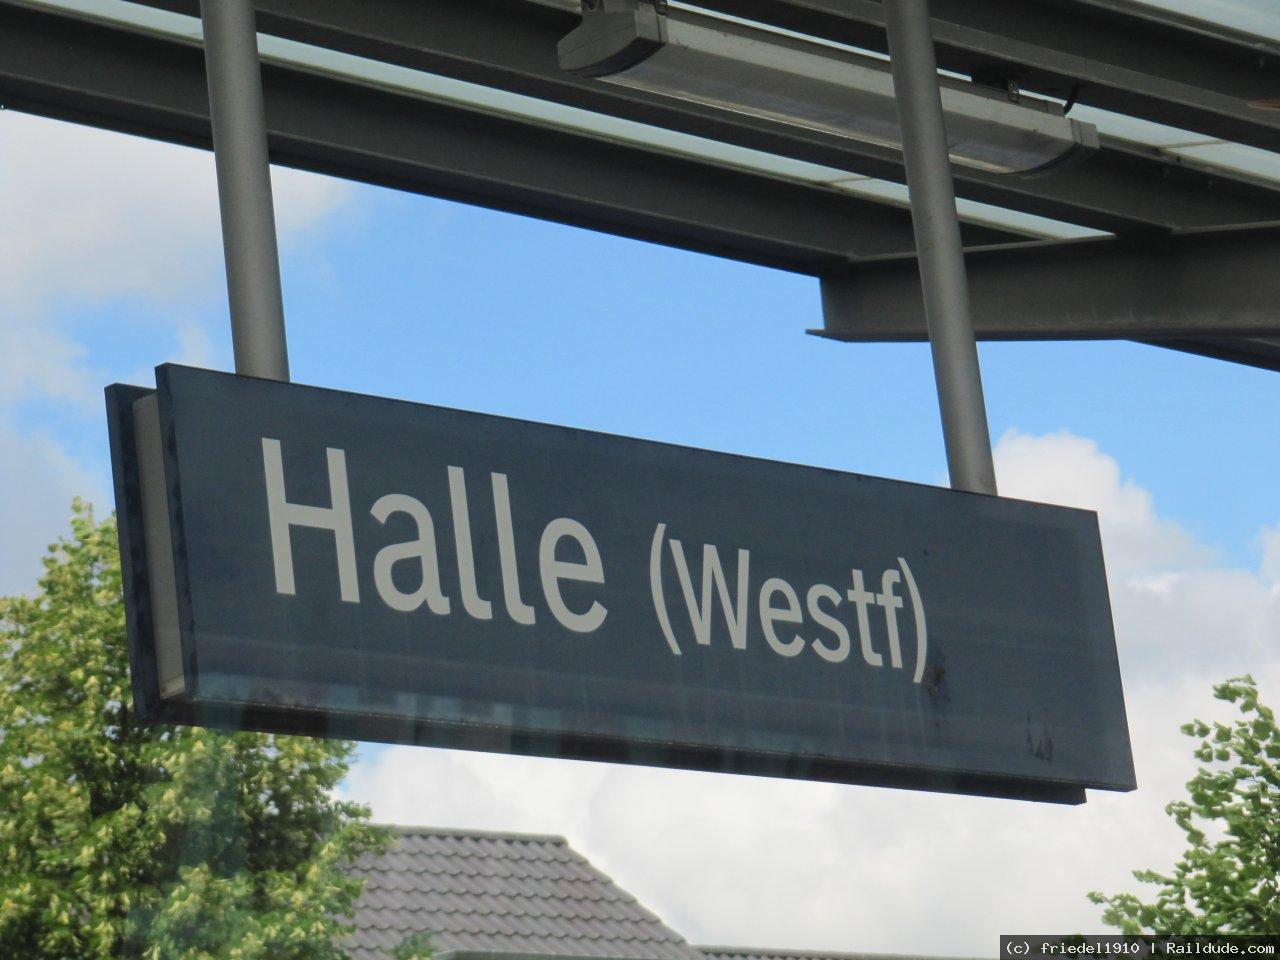 Single halle westfalen